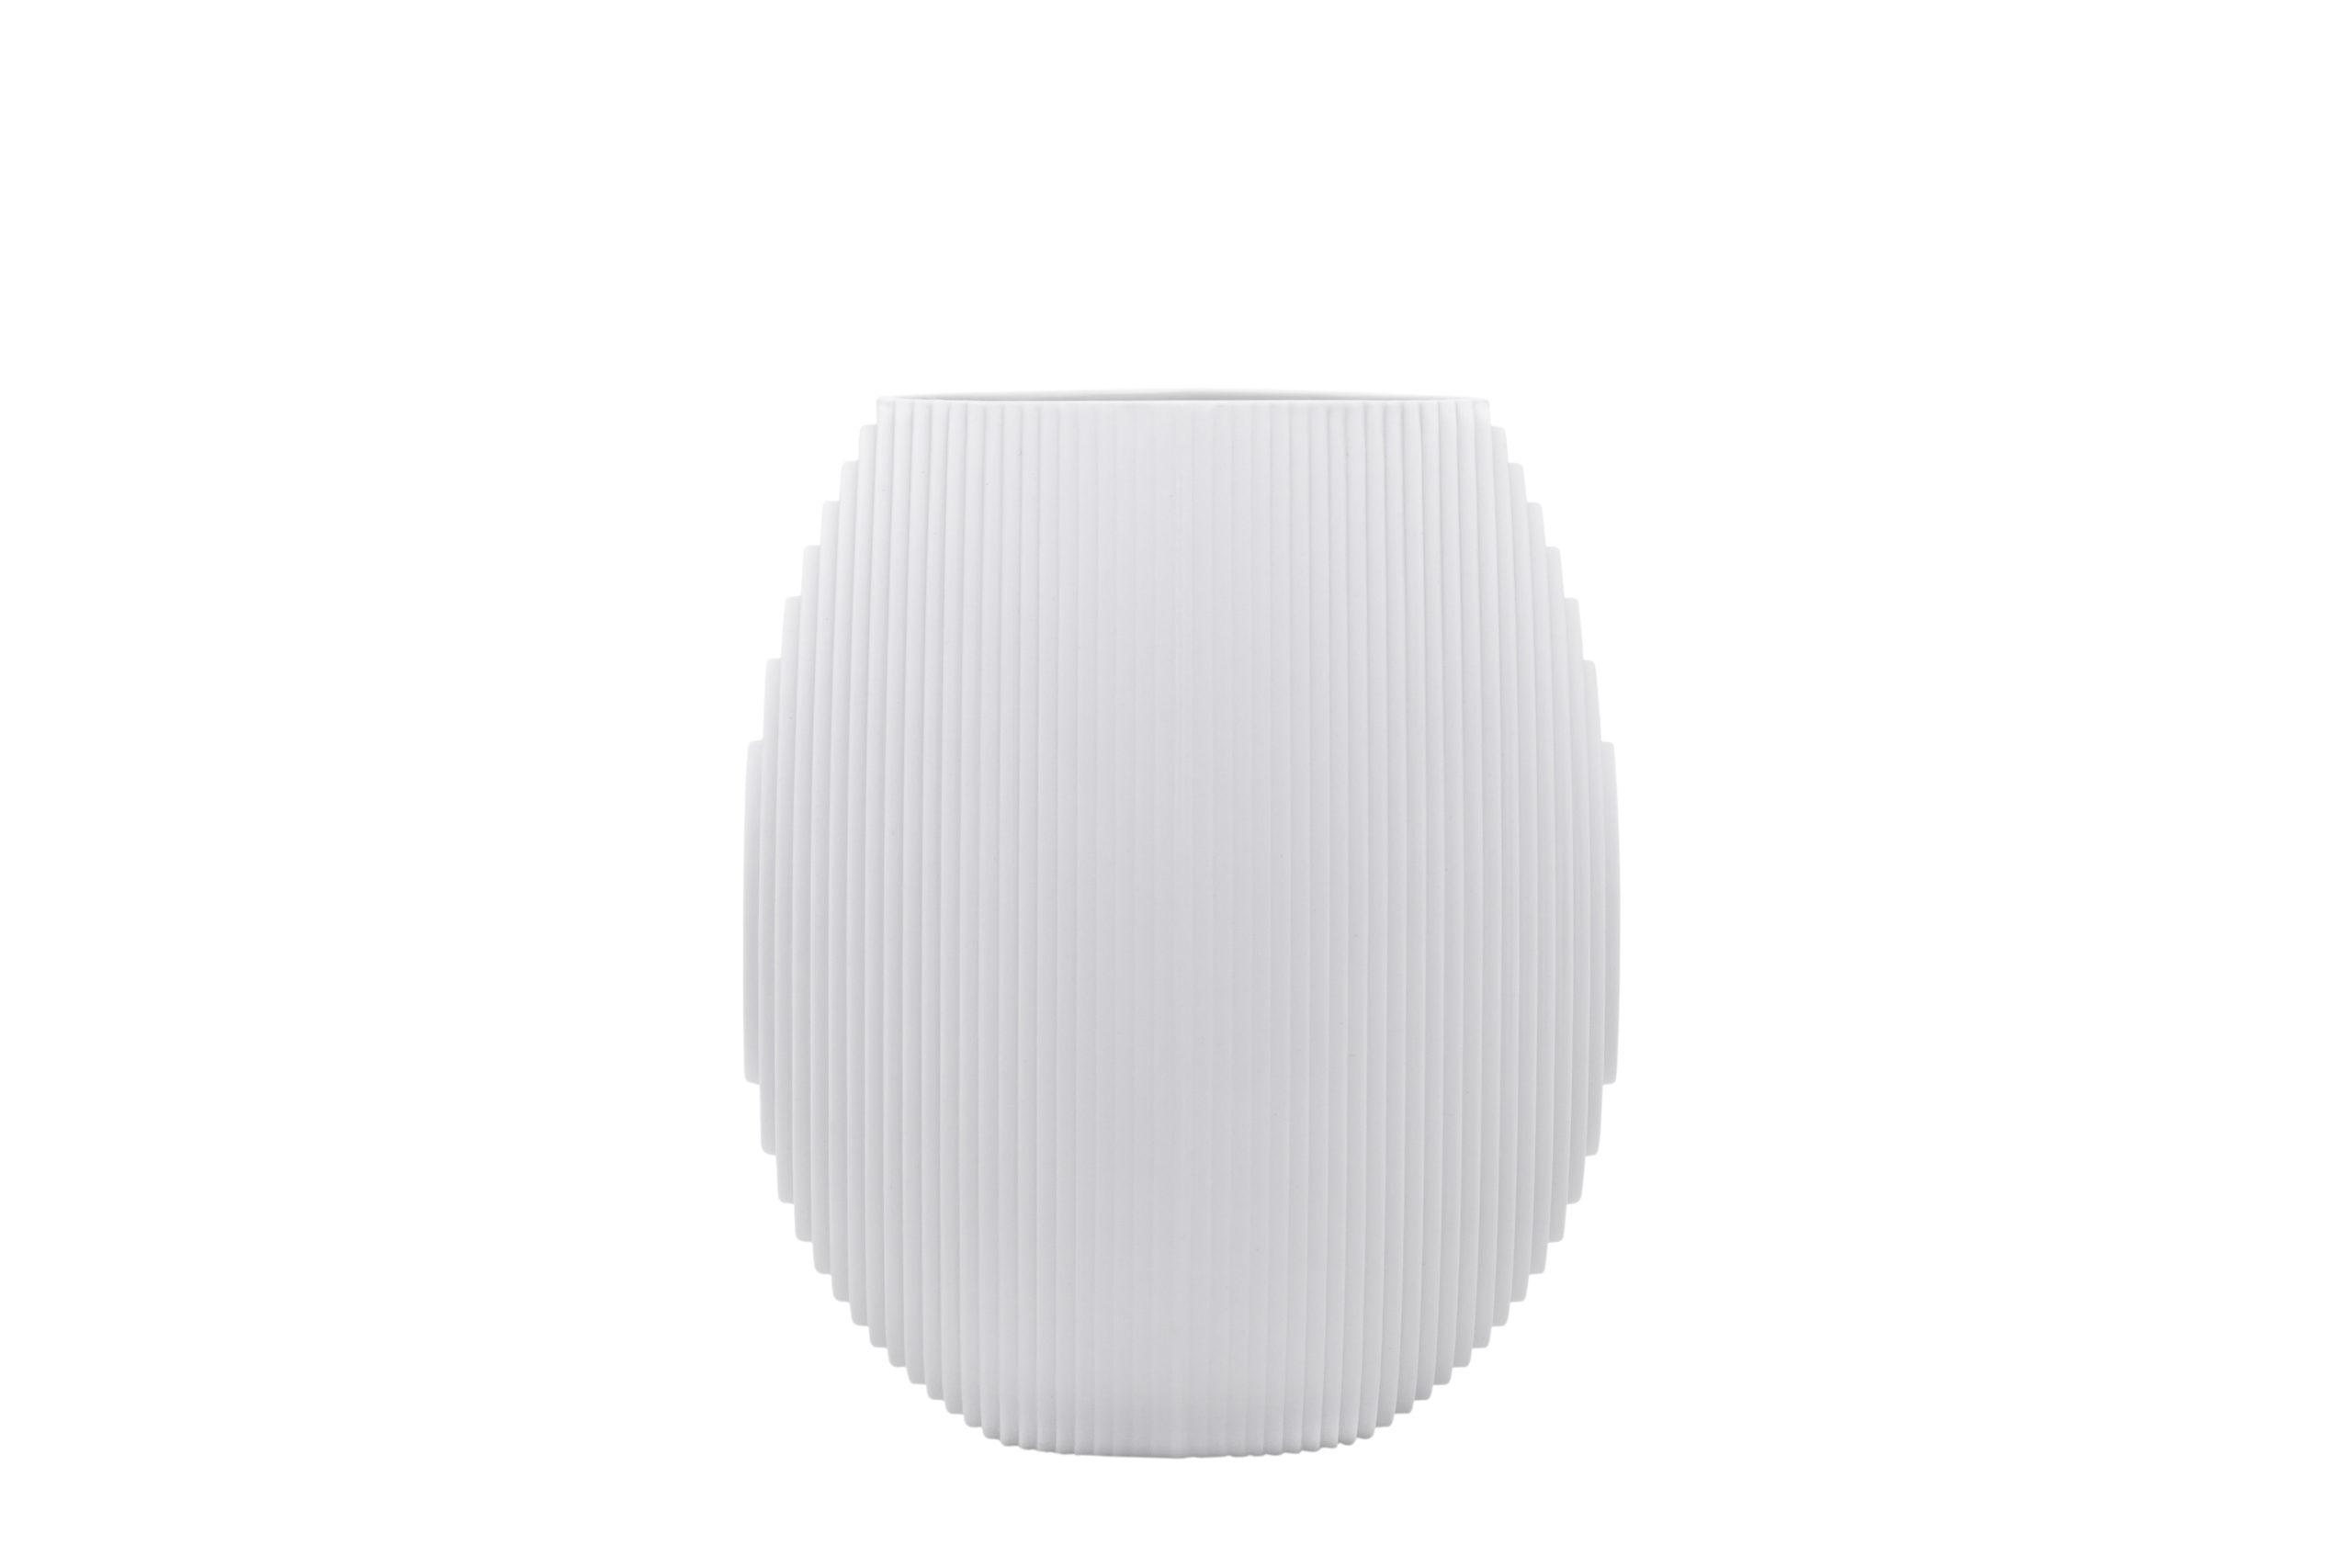 Architectmade-Flow-Bubble-Porcelain-Vibeke-Rytter-3